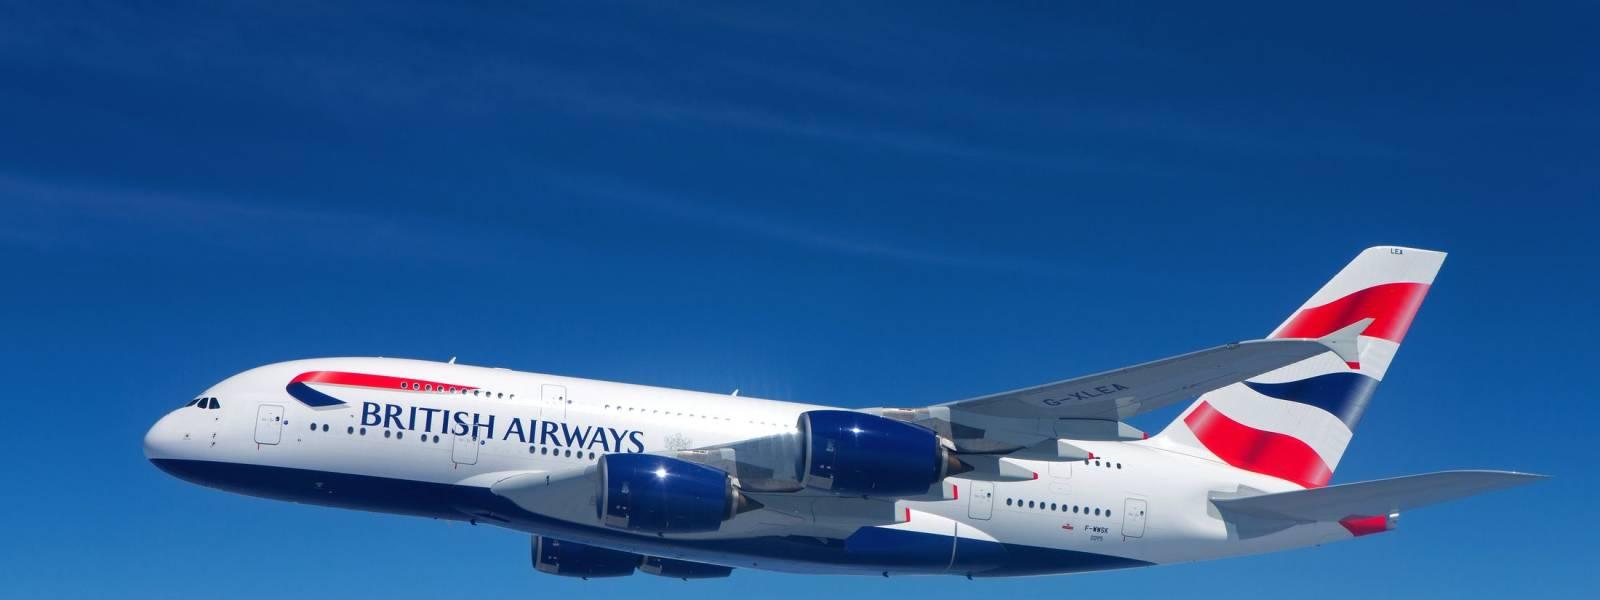 a large passenger jet flying through a blue sky